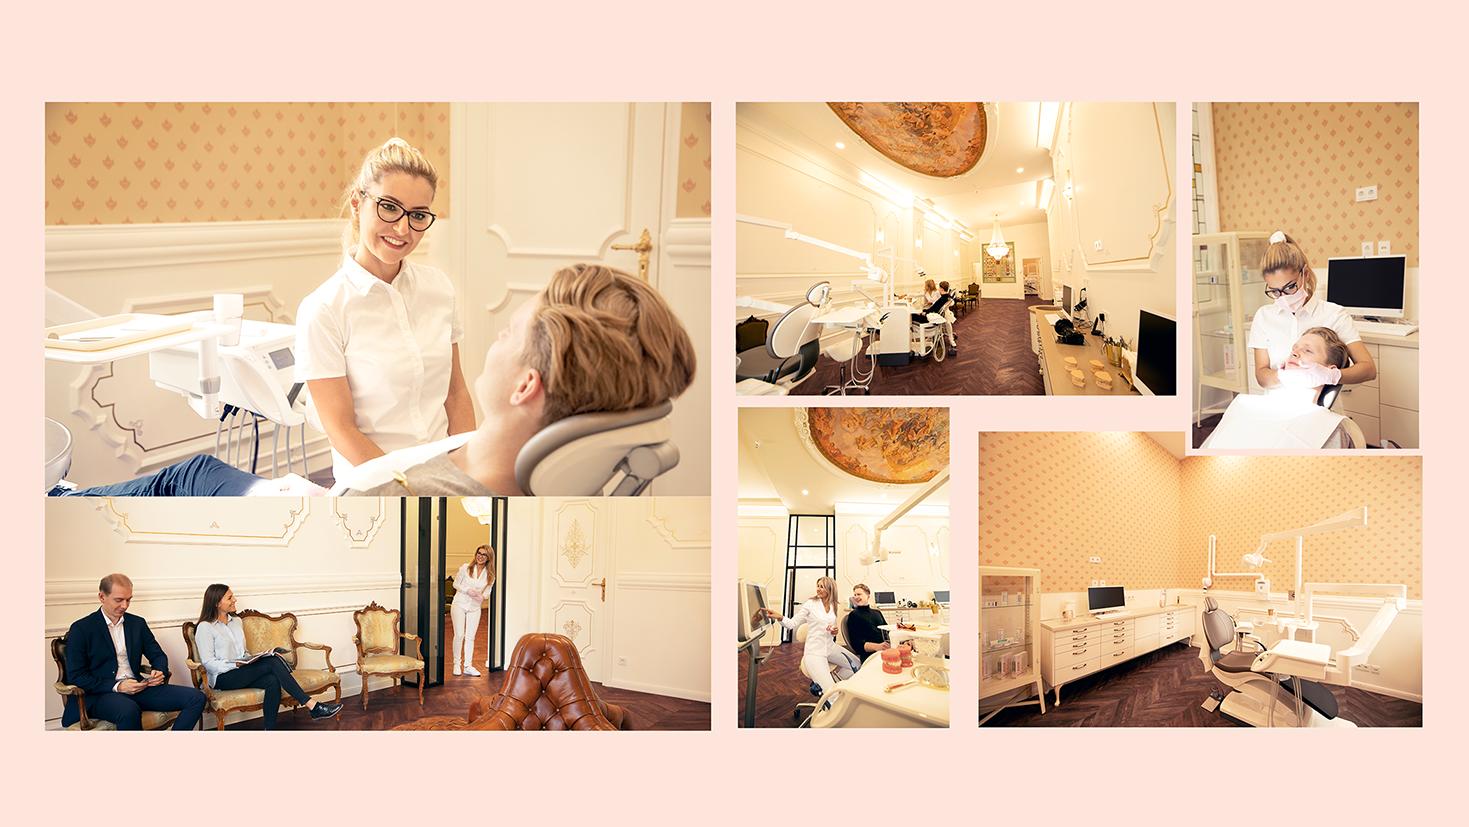 Nour, Alnader, Portfolio, Web, Fotografie, Villa Donti, Berlin, Foto, shooting